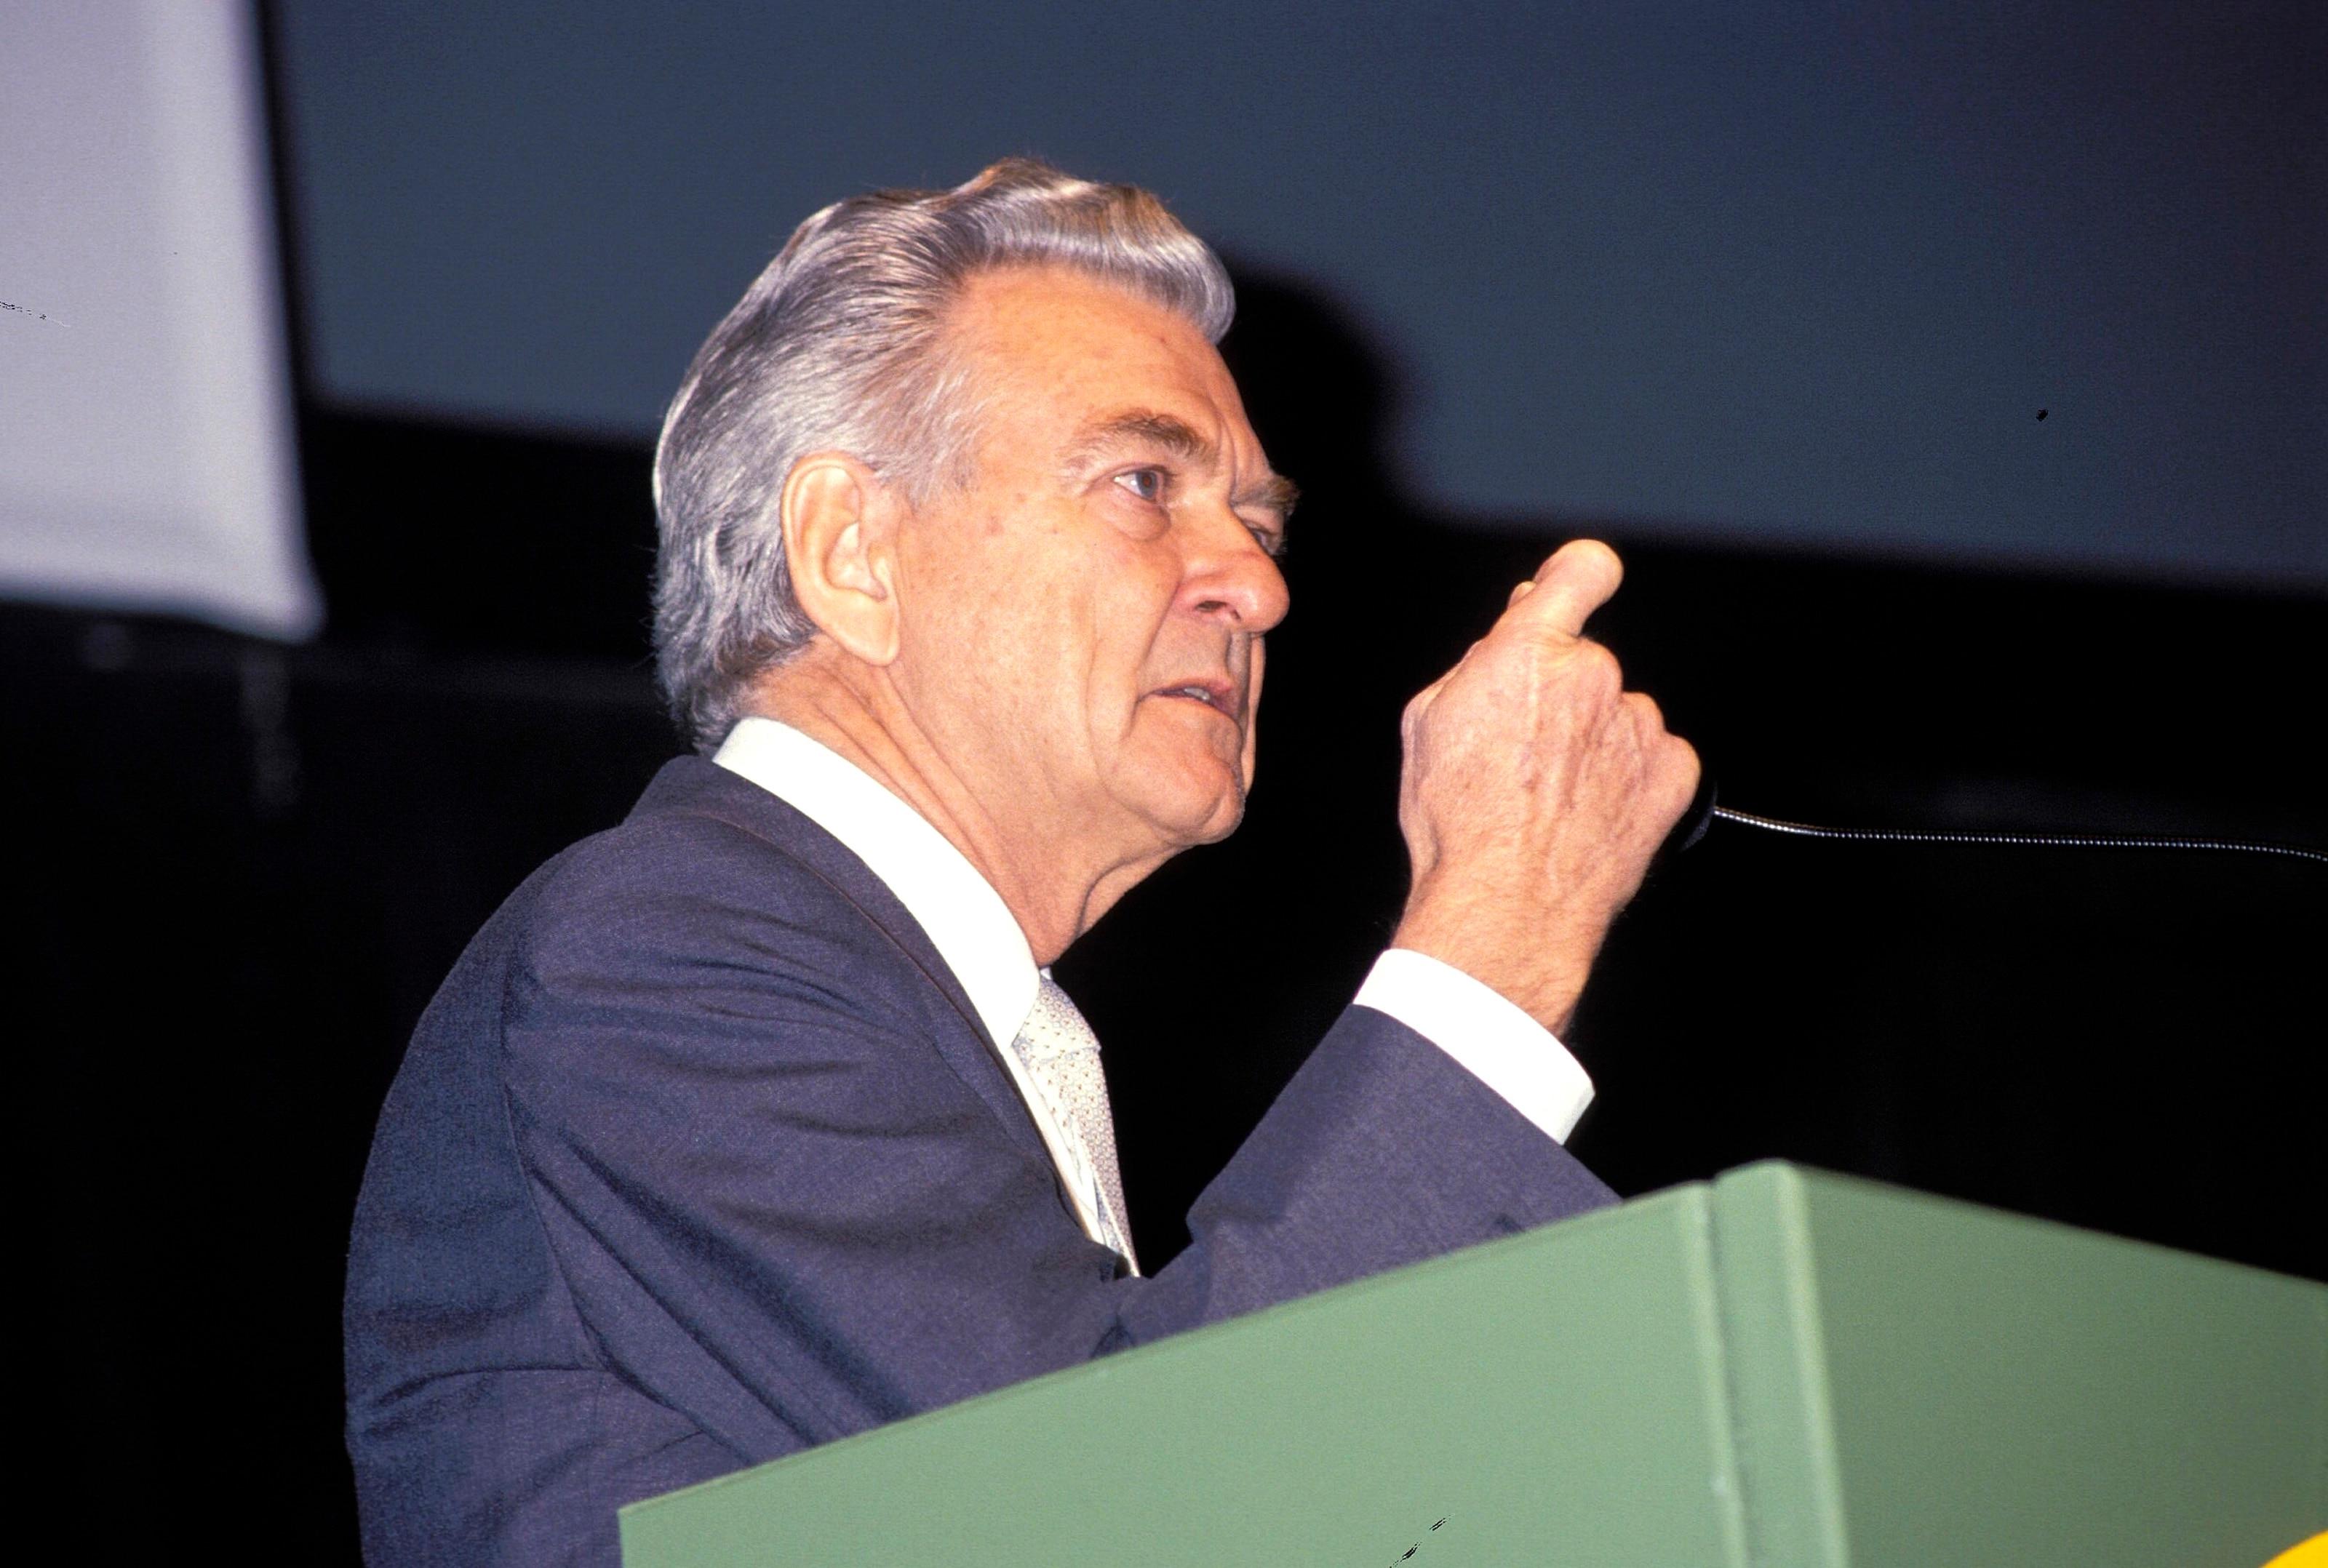 Bob Hawke, Prime Minister of Australia (1983 - 1991)